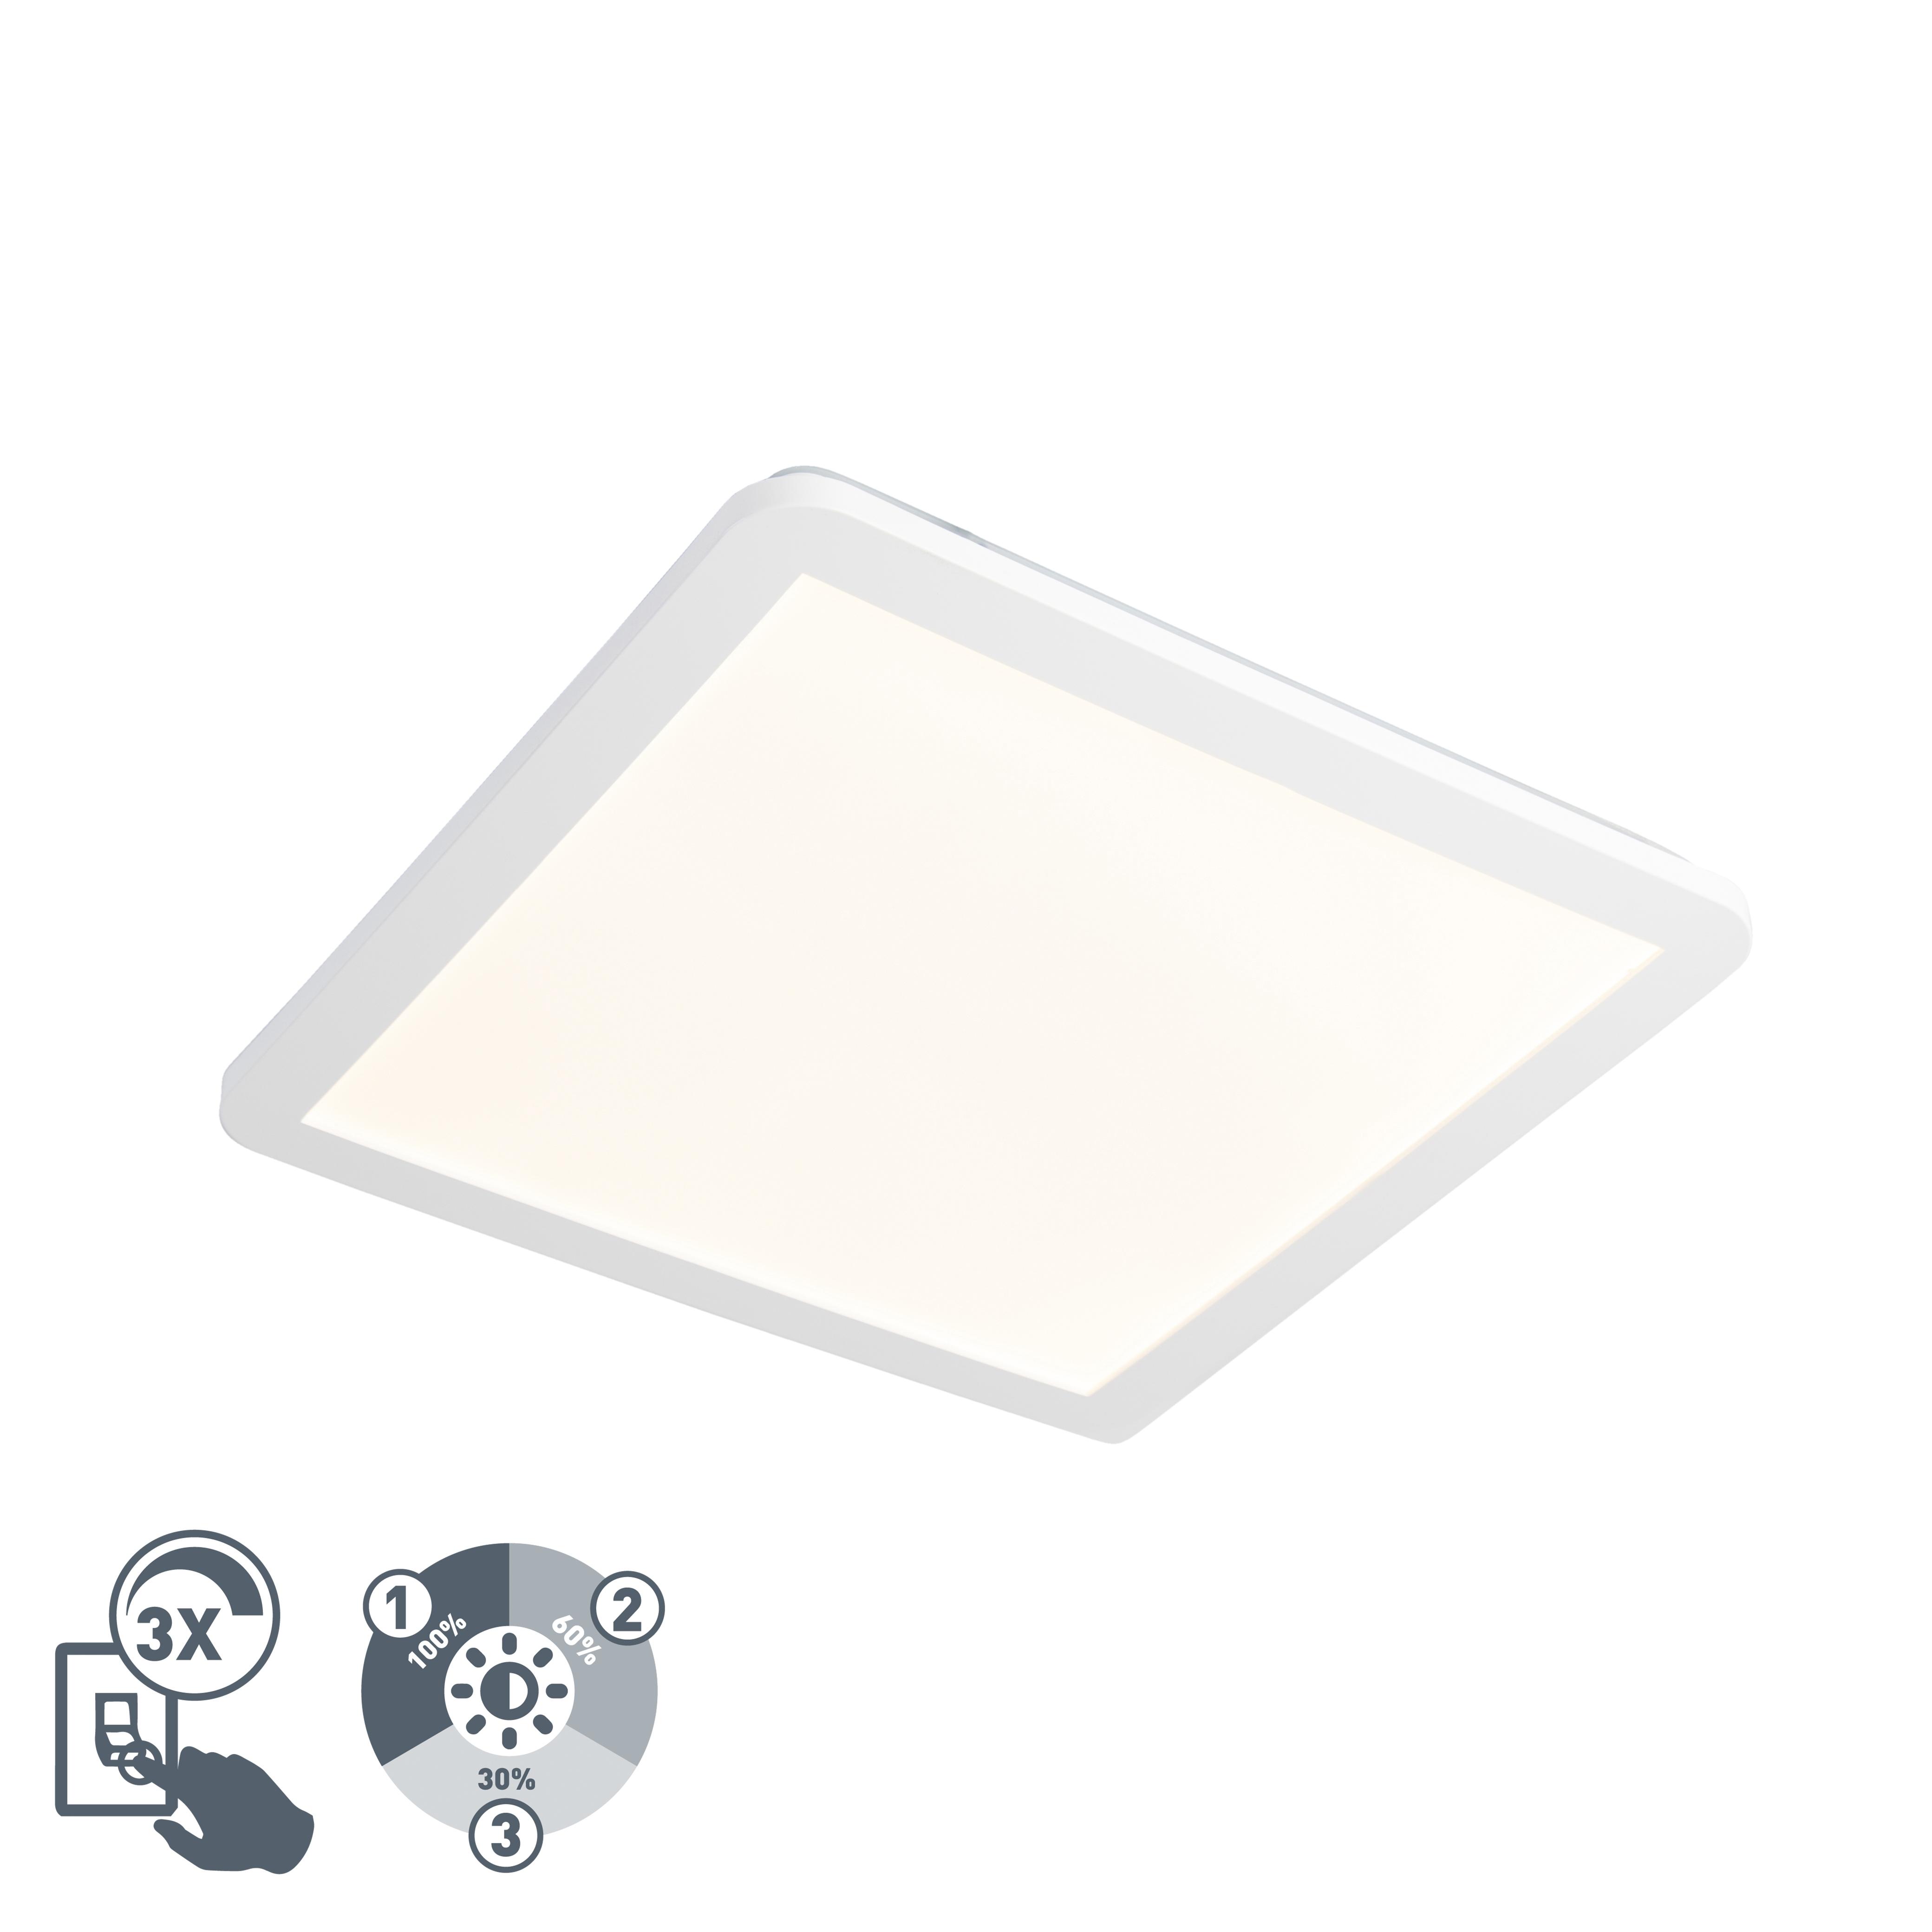 Vierkante plafondlamp wit 40 cm incl. LED IP44 - Camilla